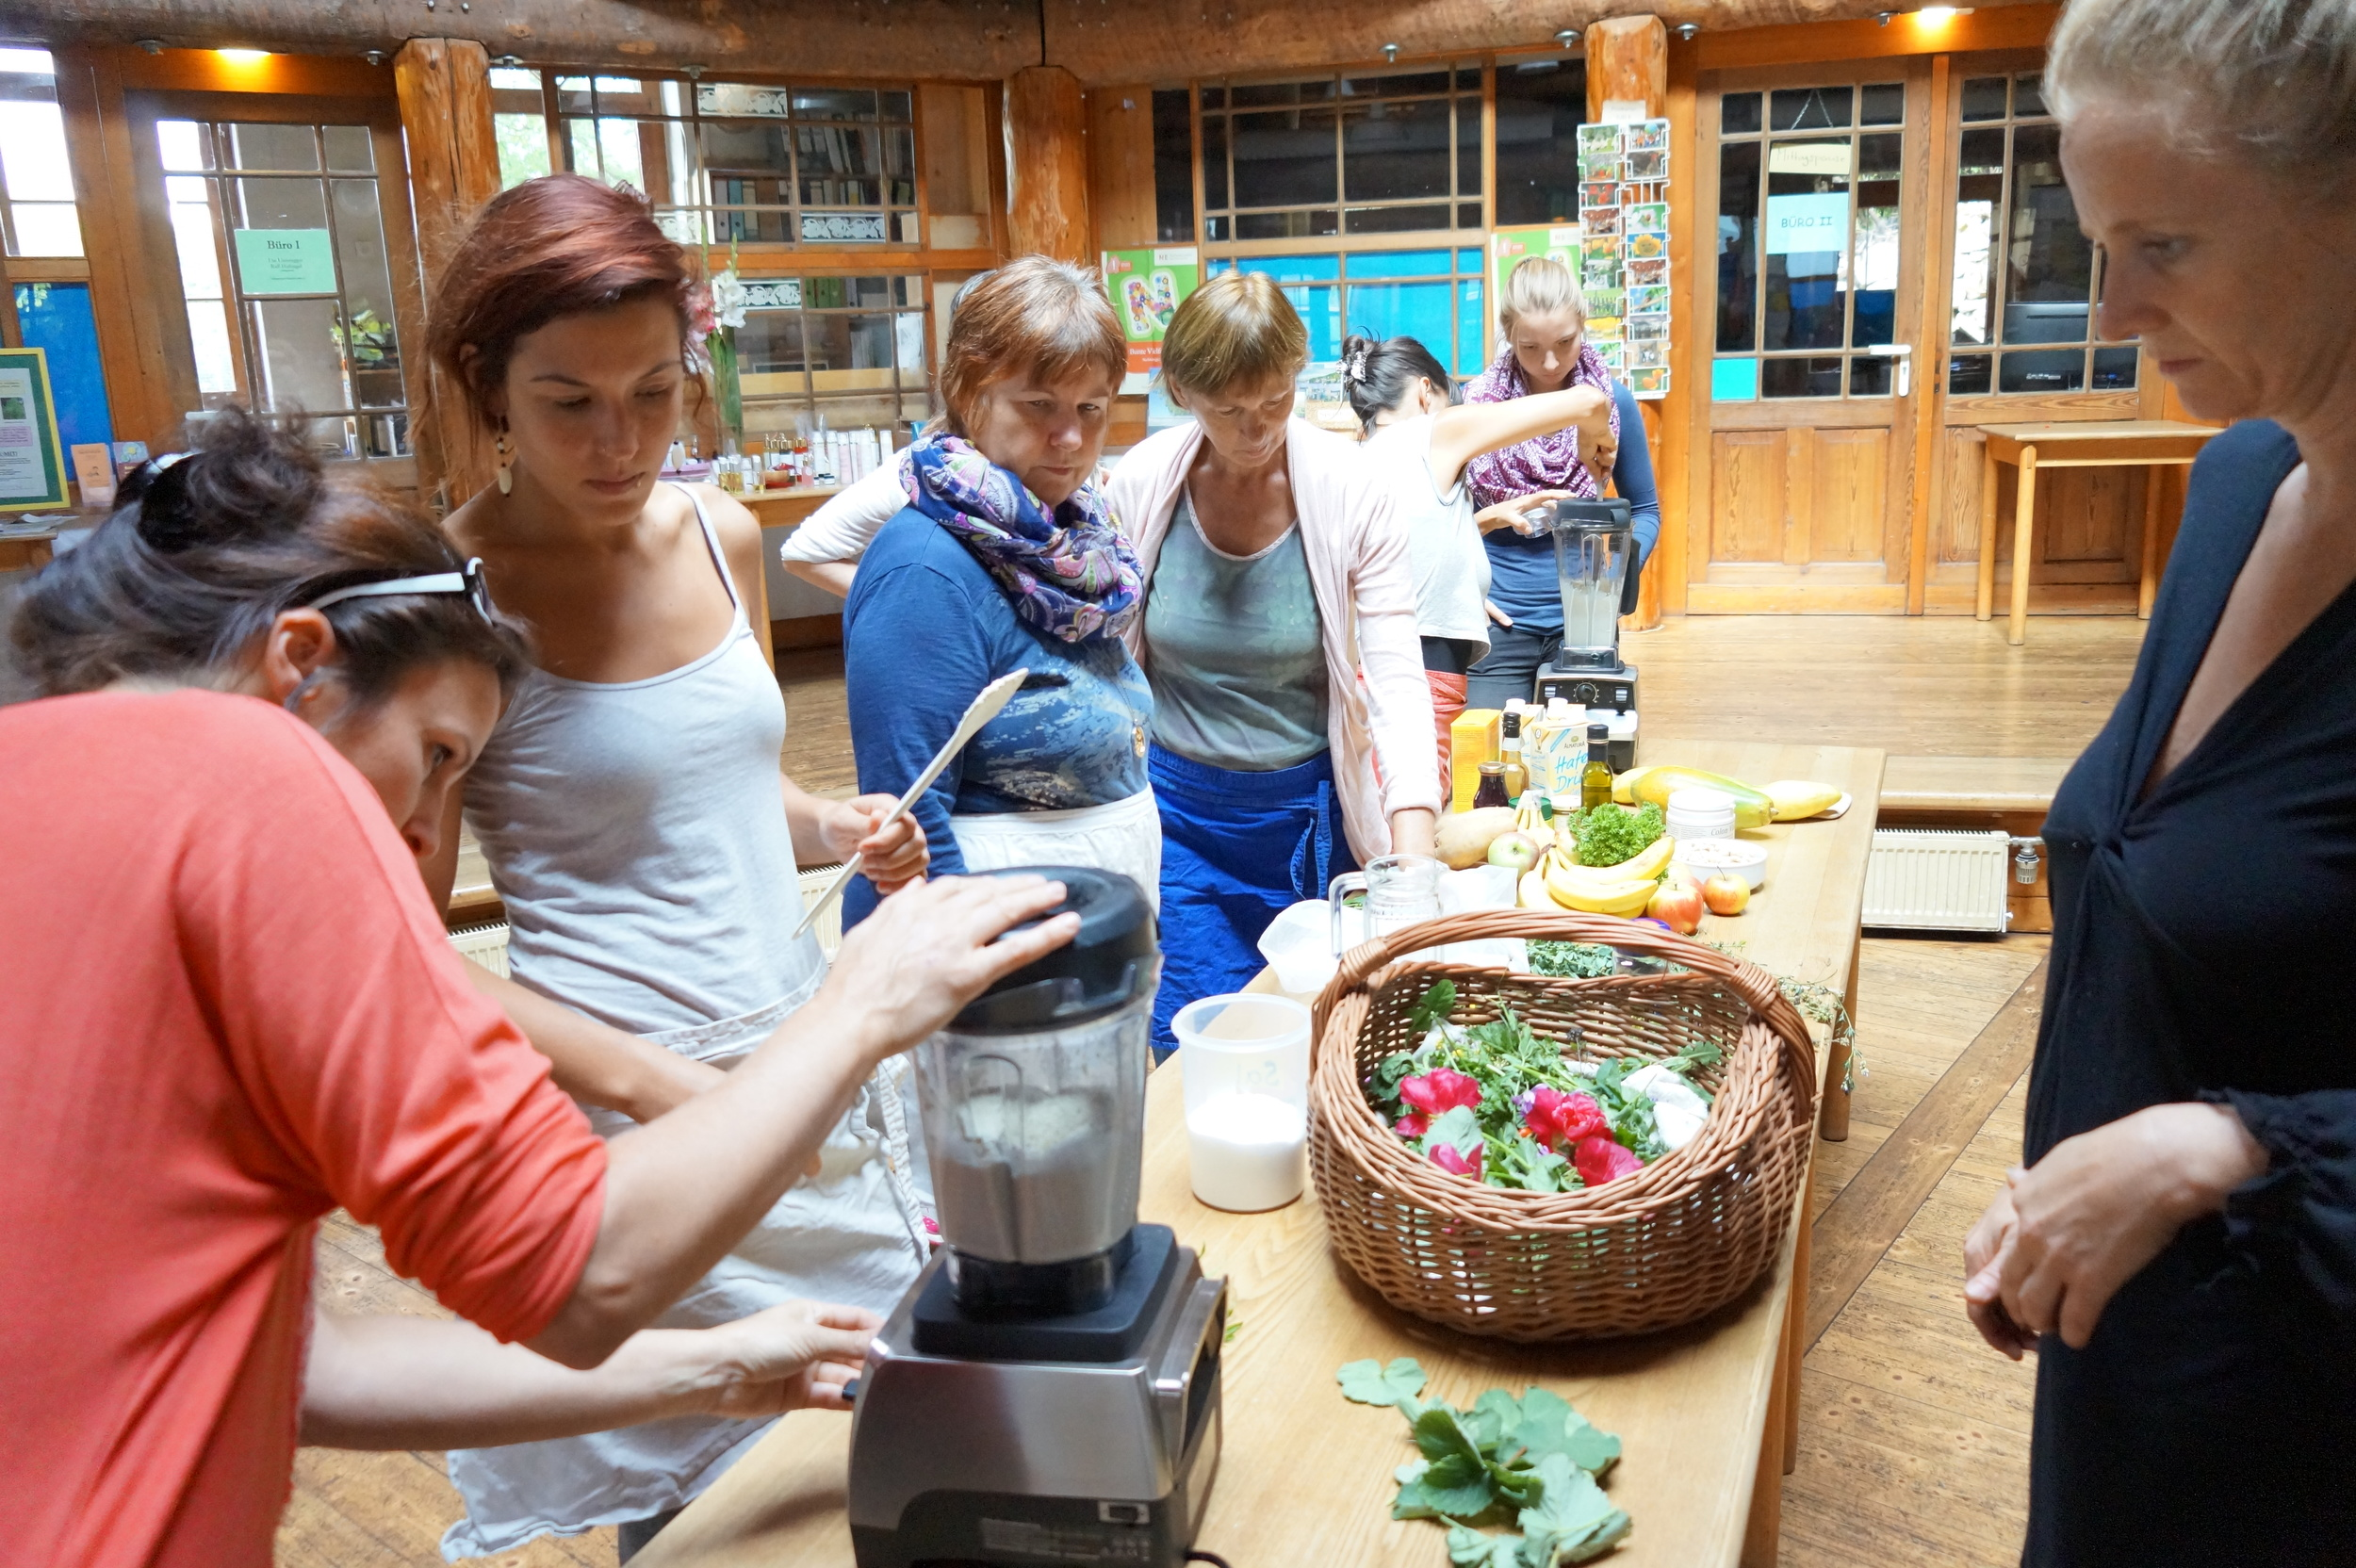 Making almond ricotta dip- heavenly!